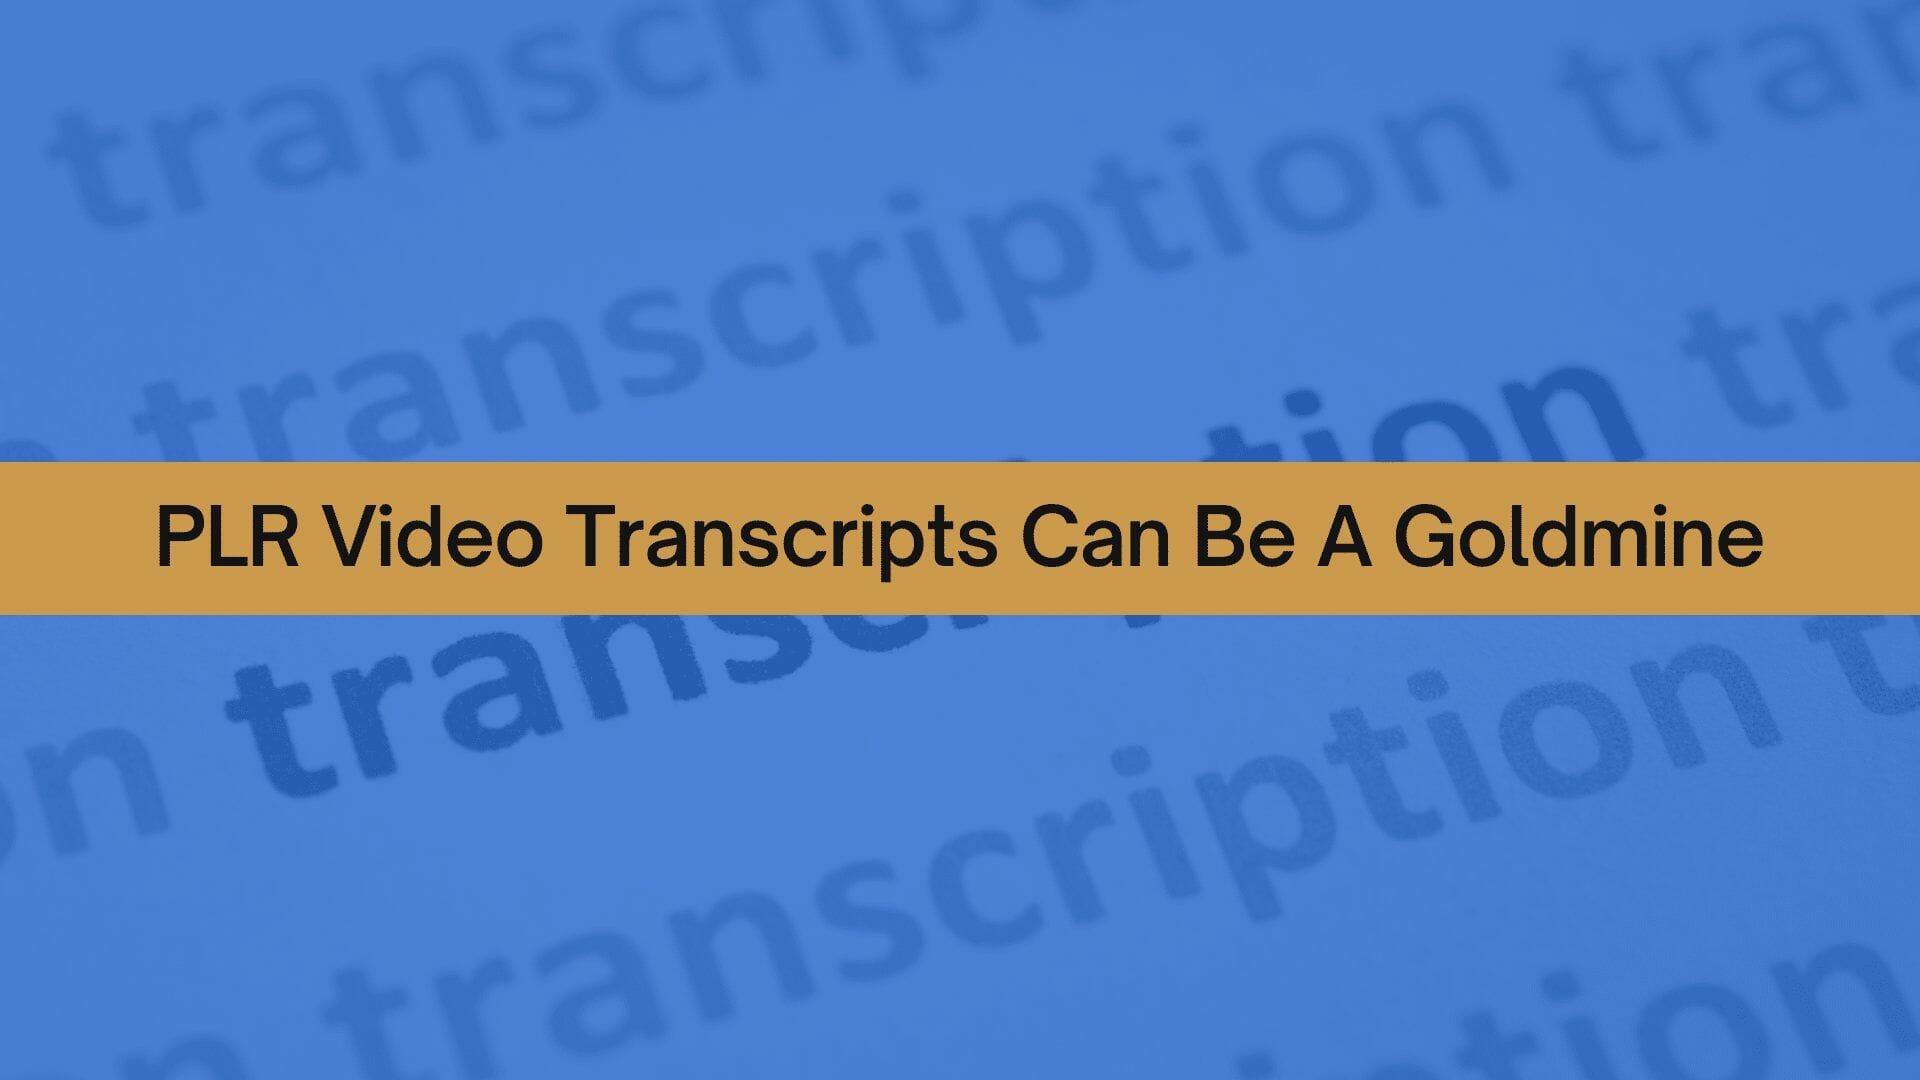 PLRVD Transcripts can be a goldmine